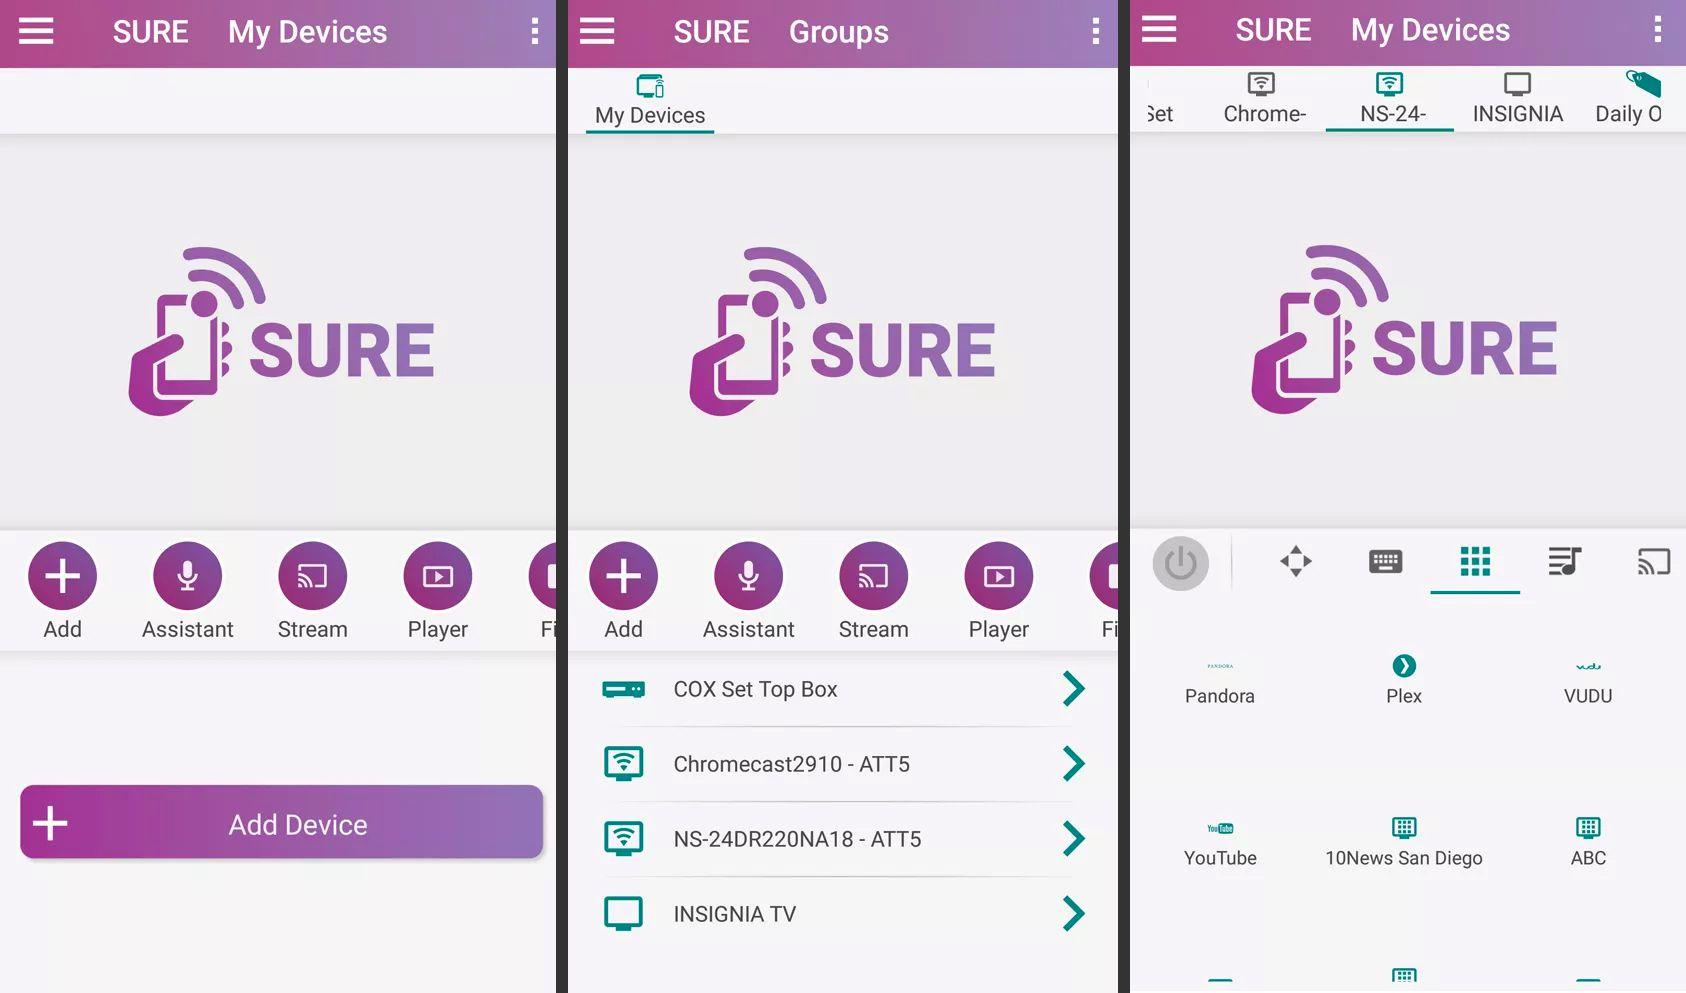 SURE Universal Smart TV Remote Control app